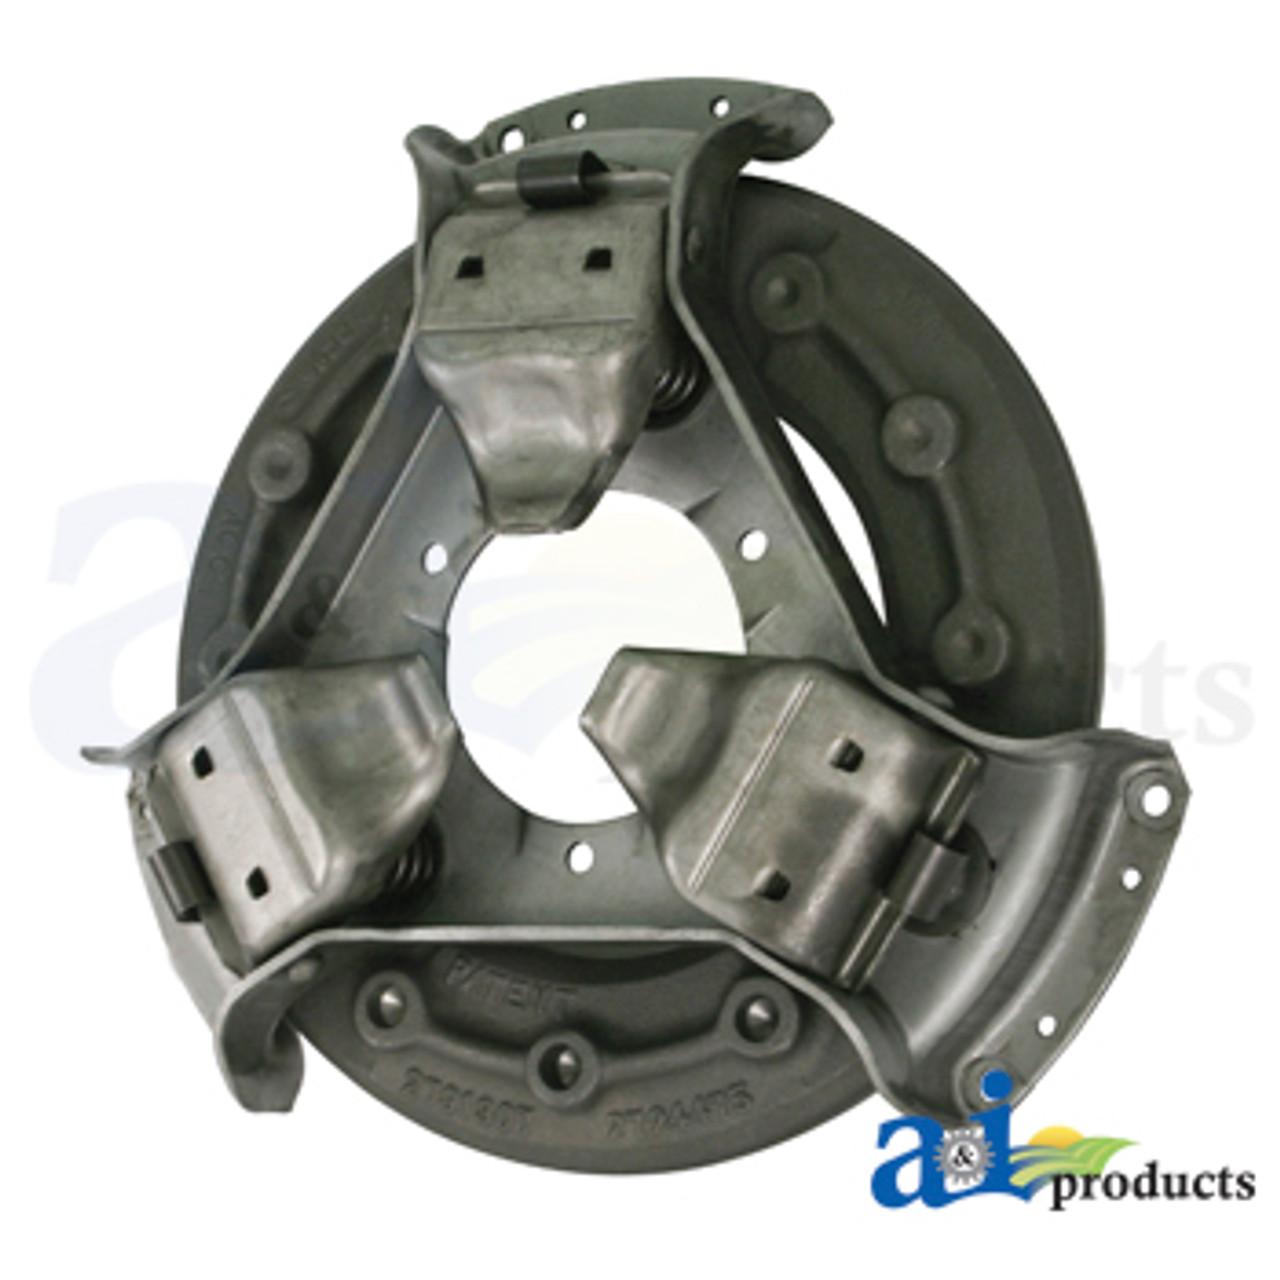 Dial Caliper Dial Hand 0.7mm Diameter Hole For Mitutoyo 505 Dial Caliper 900257